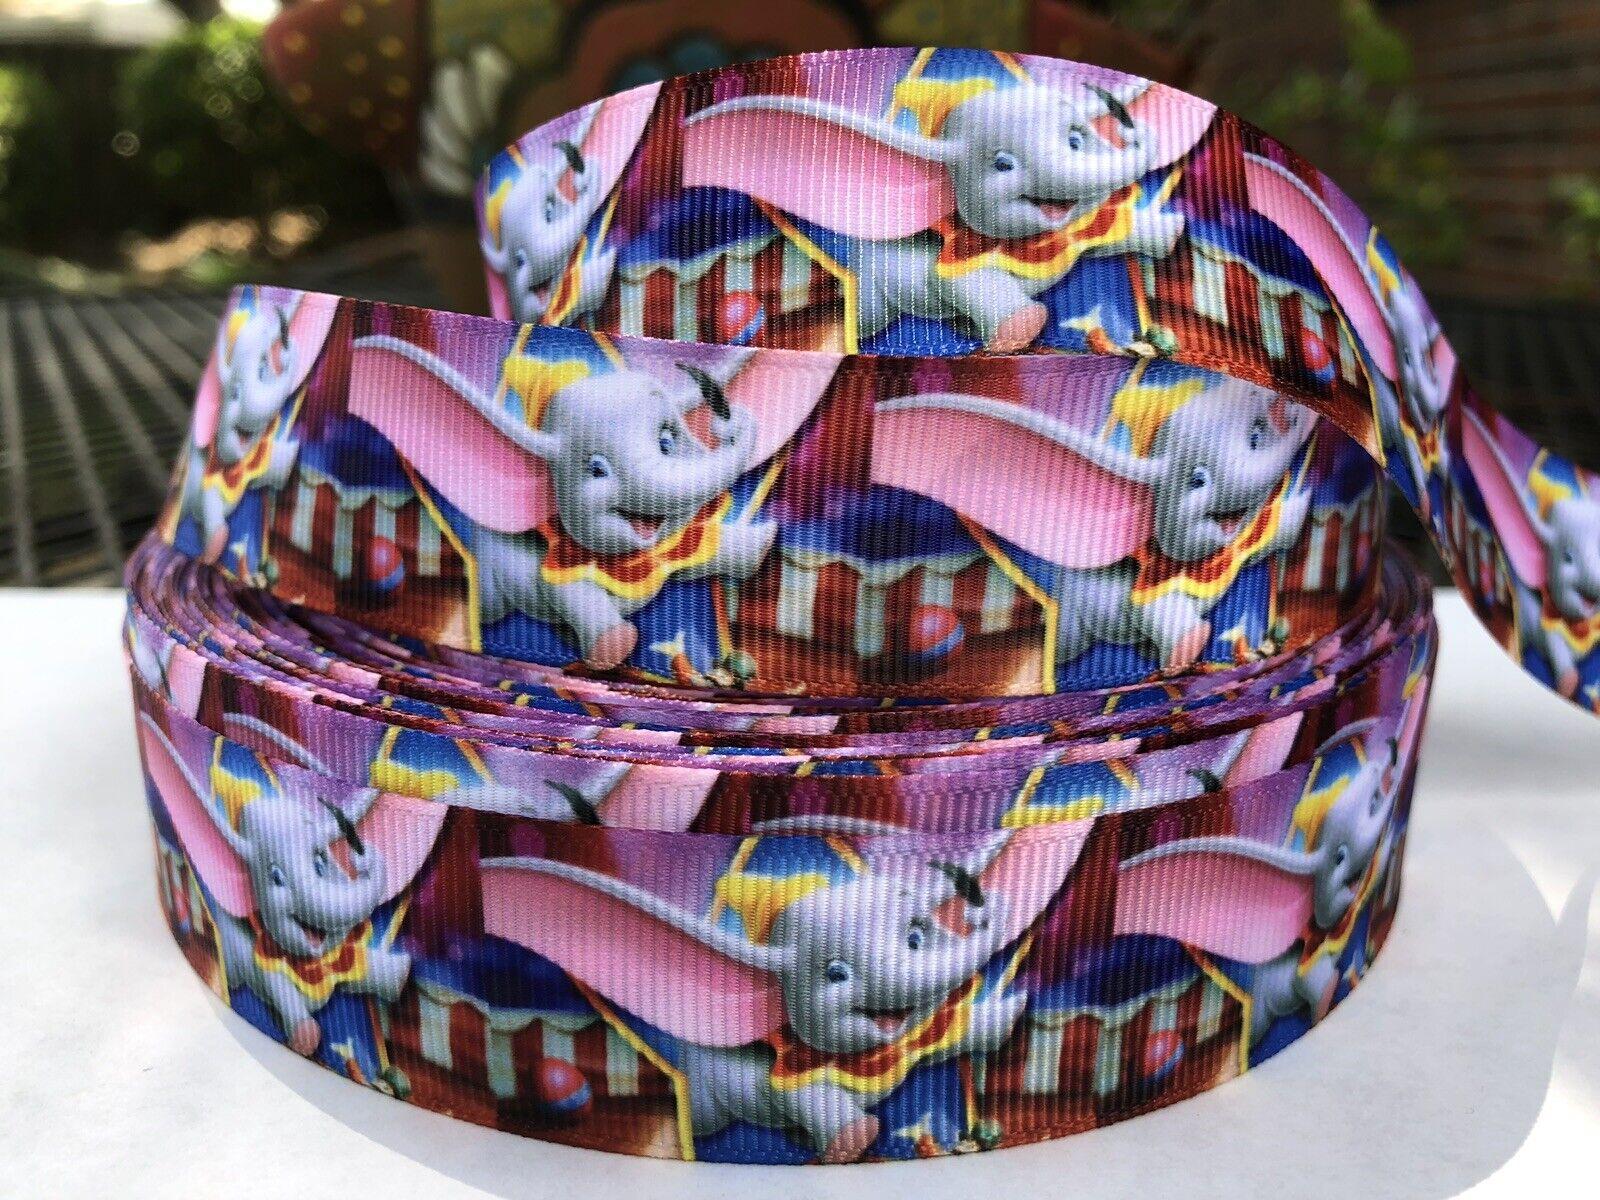 By The Yard 1 Inch Printed Disney Dumbo Grosgrain Ribbon Hair Bows Lisa